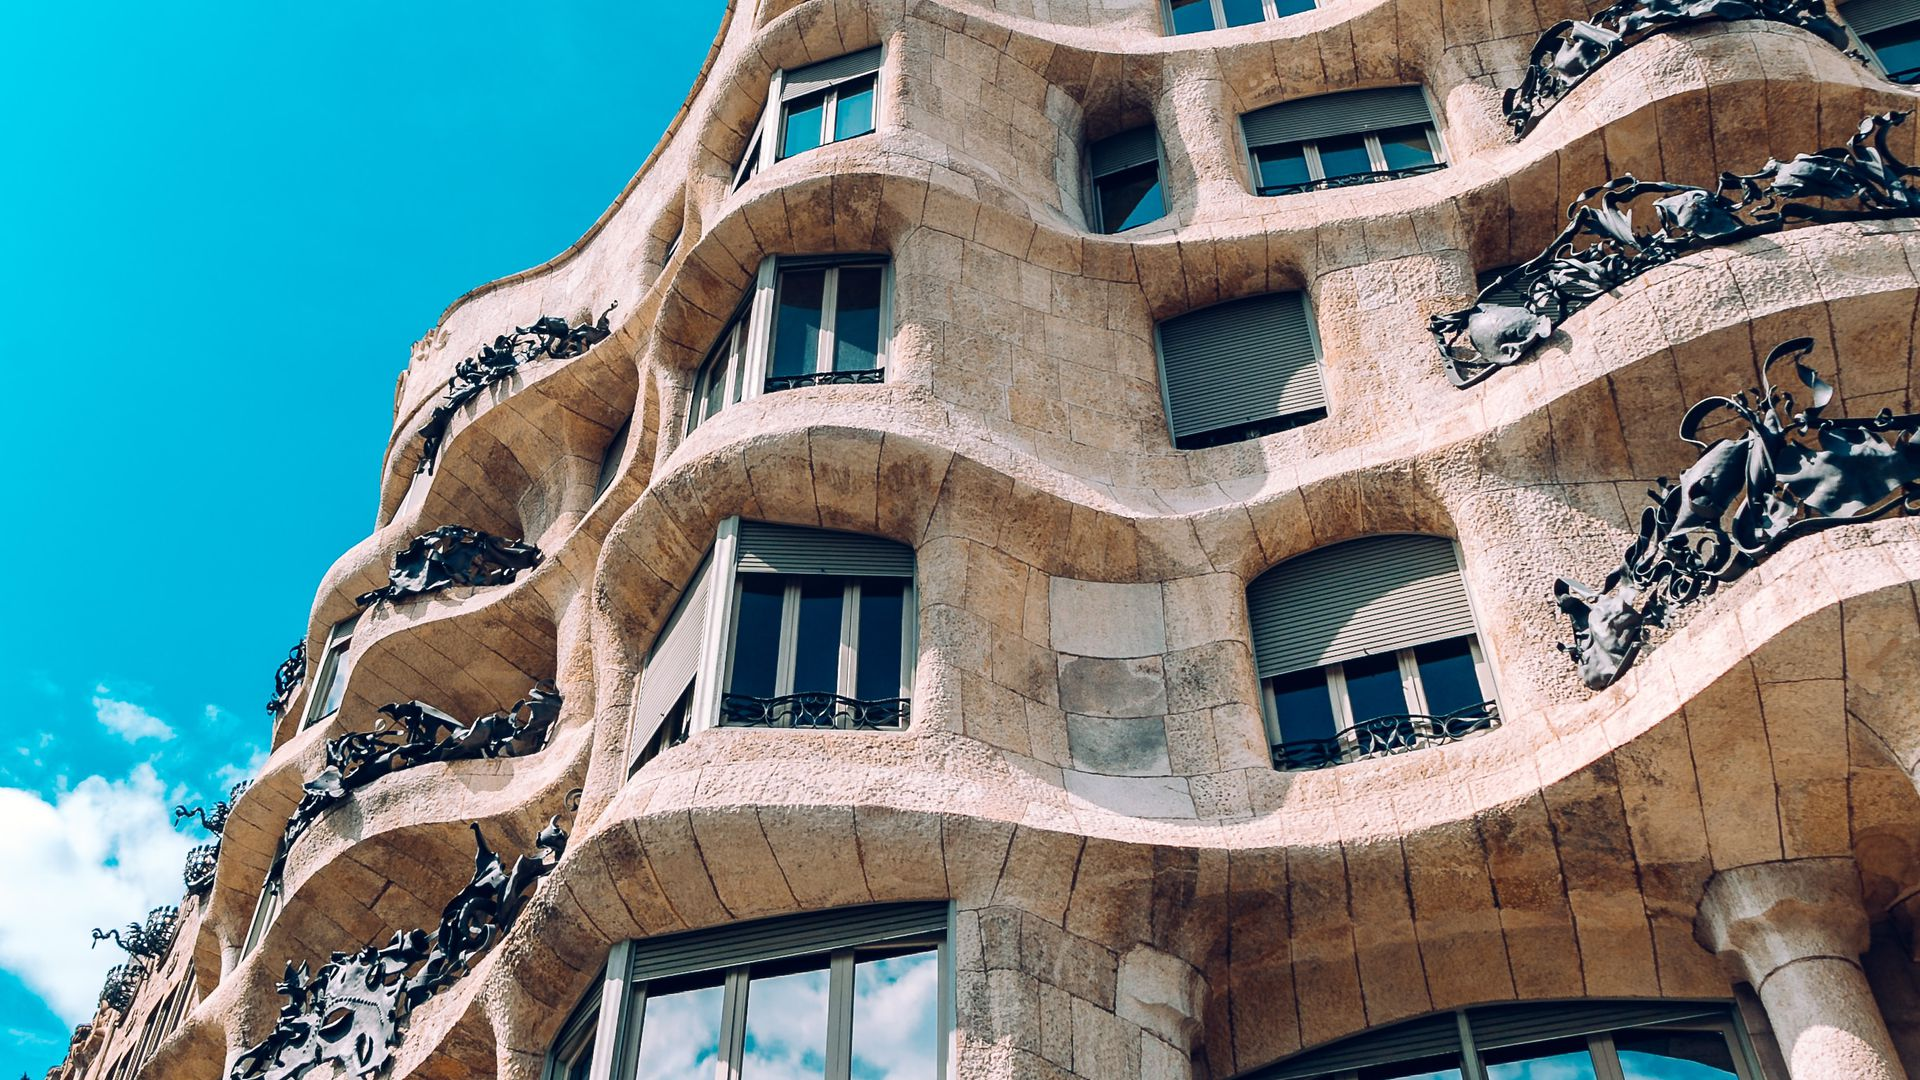 Casa Milà La Pedrera: Skip-The-Line Ticket & Audio Tour